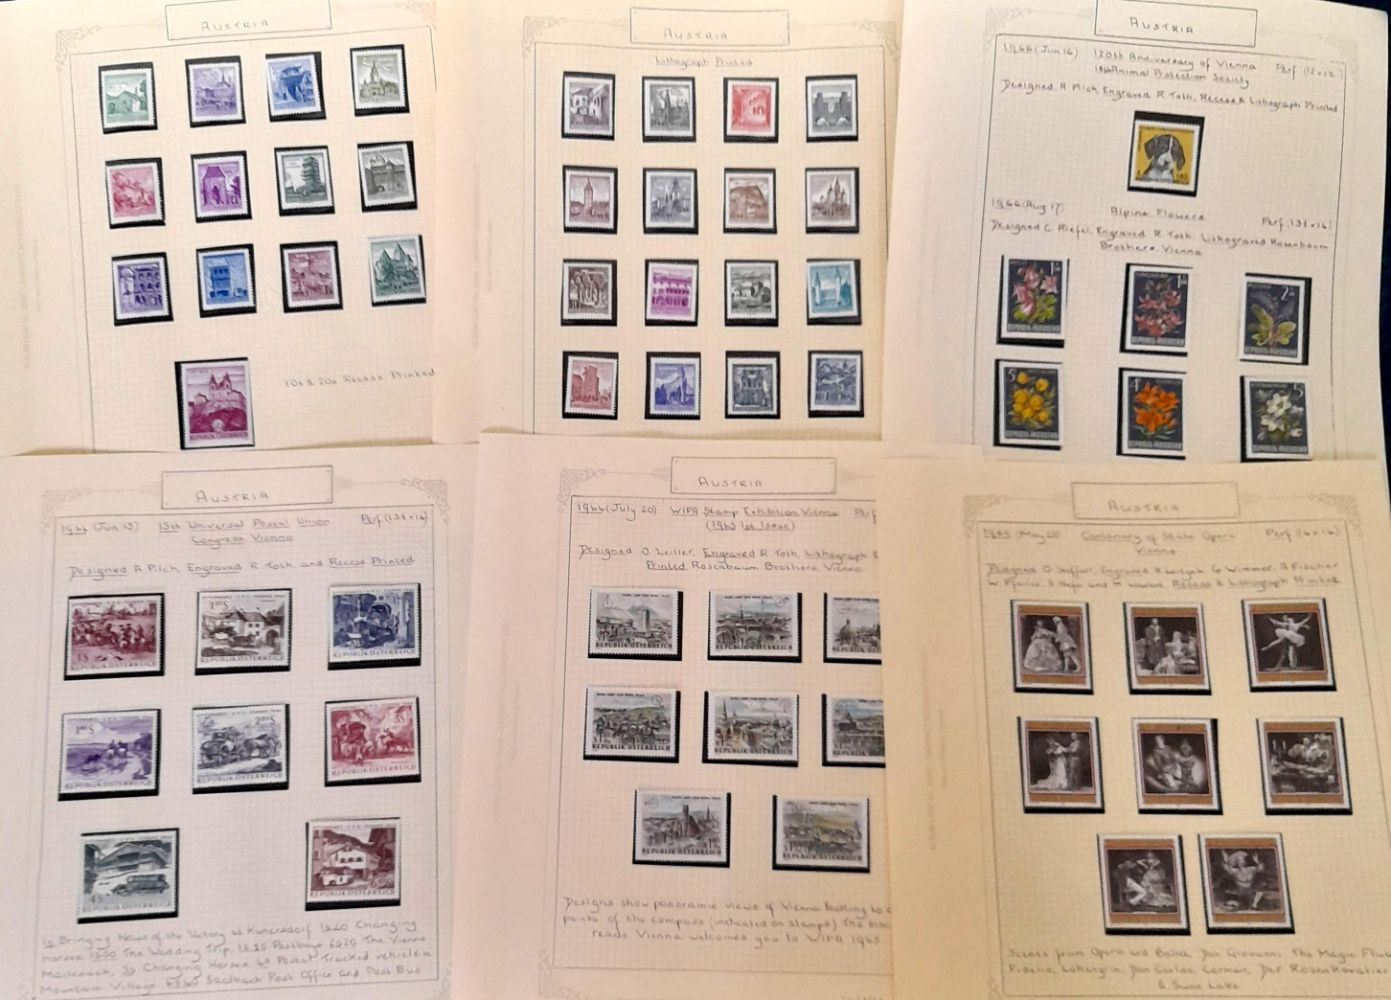 Memorabilia & Collectables Auction.. Stamps, Vinyl Records, Sports Memorabilia, Die-Cast Toys,Postcards, Comics, Coins, Collectables